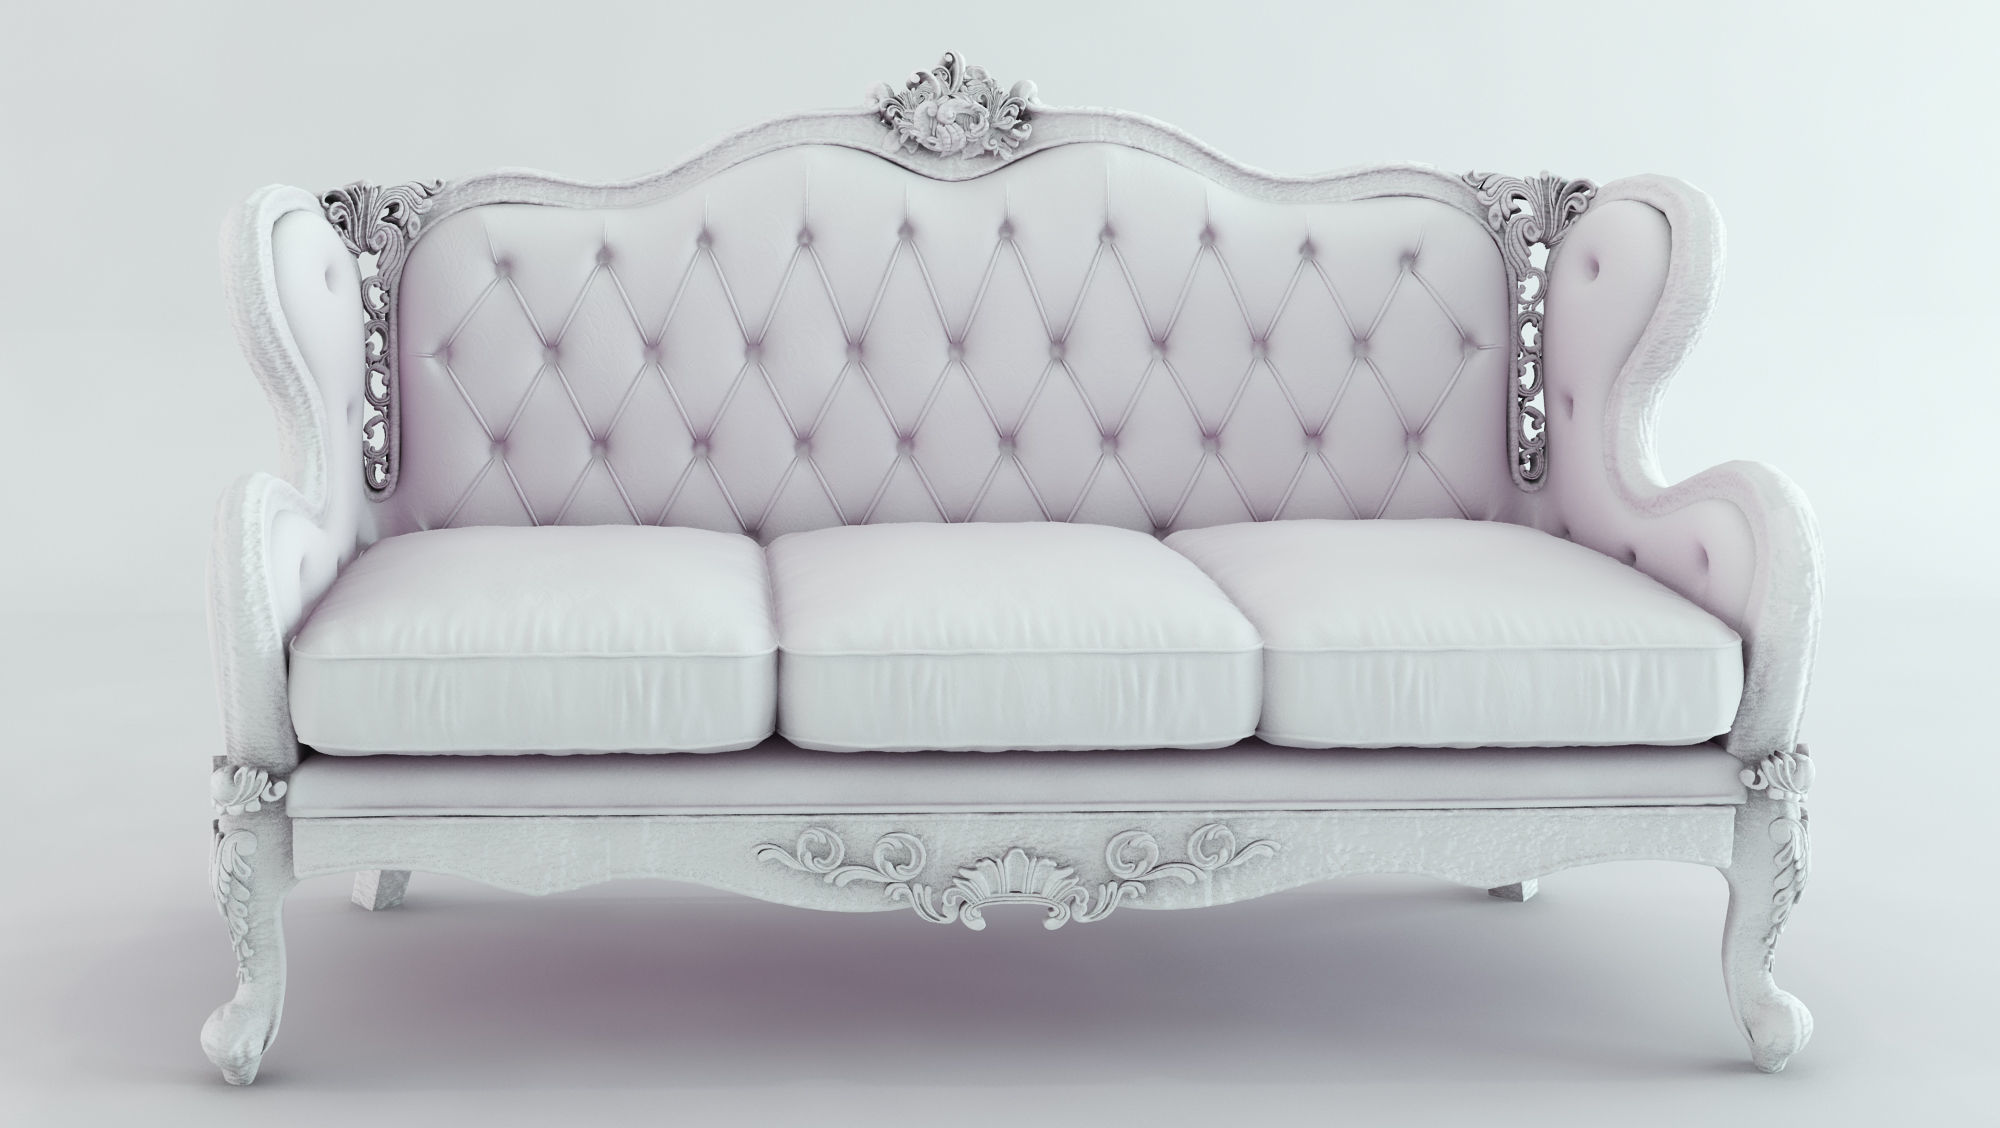 classic sofa jonathan louis reviews italian 3d cgtrader model